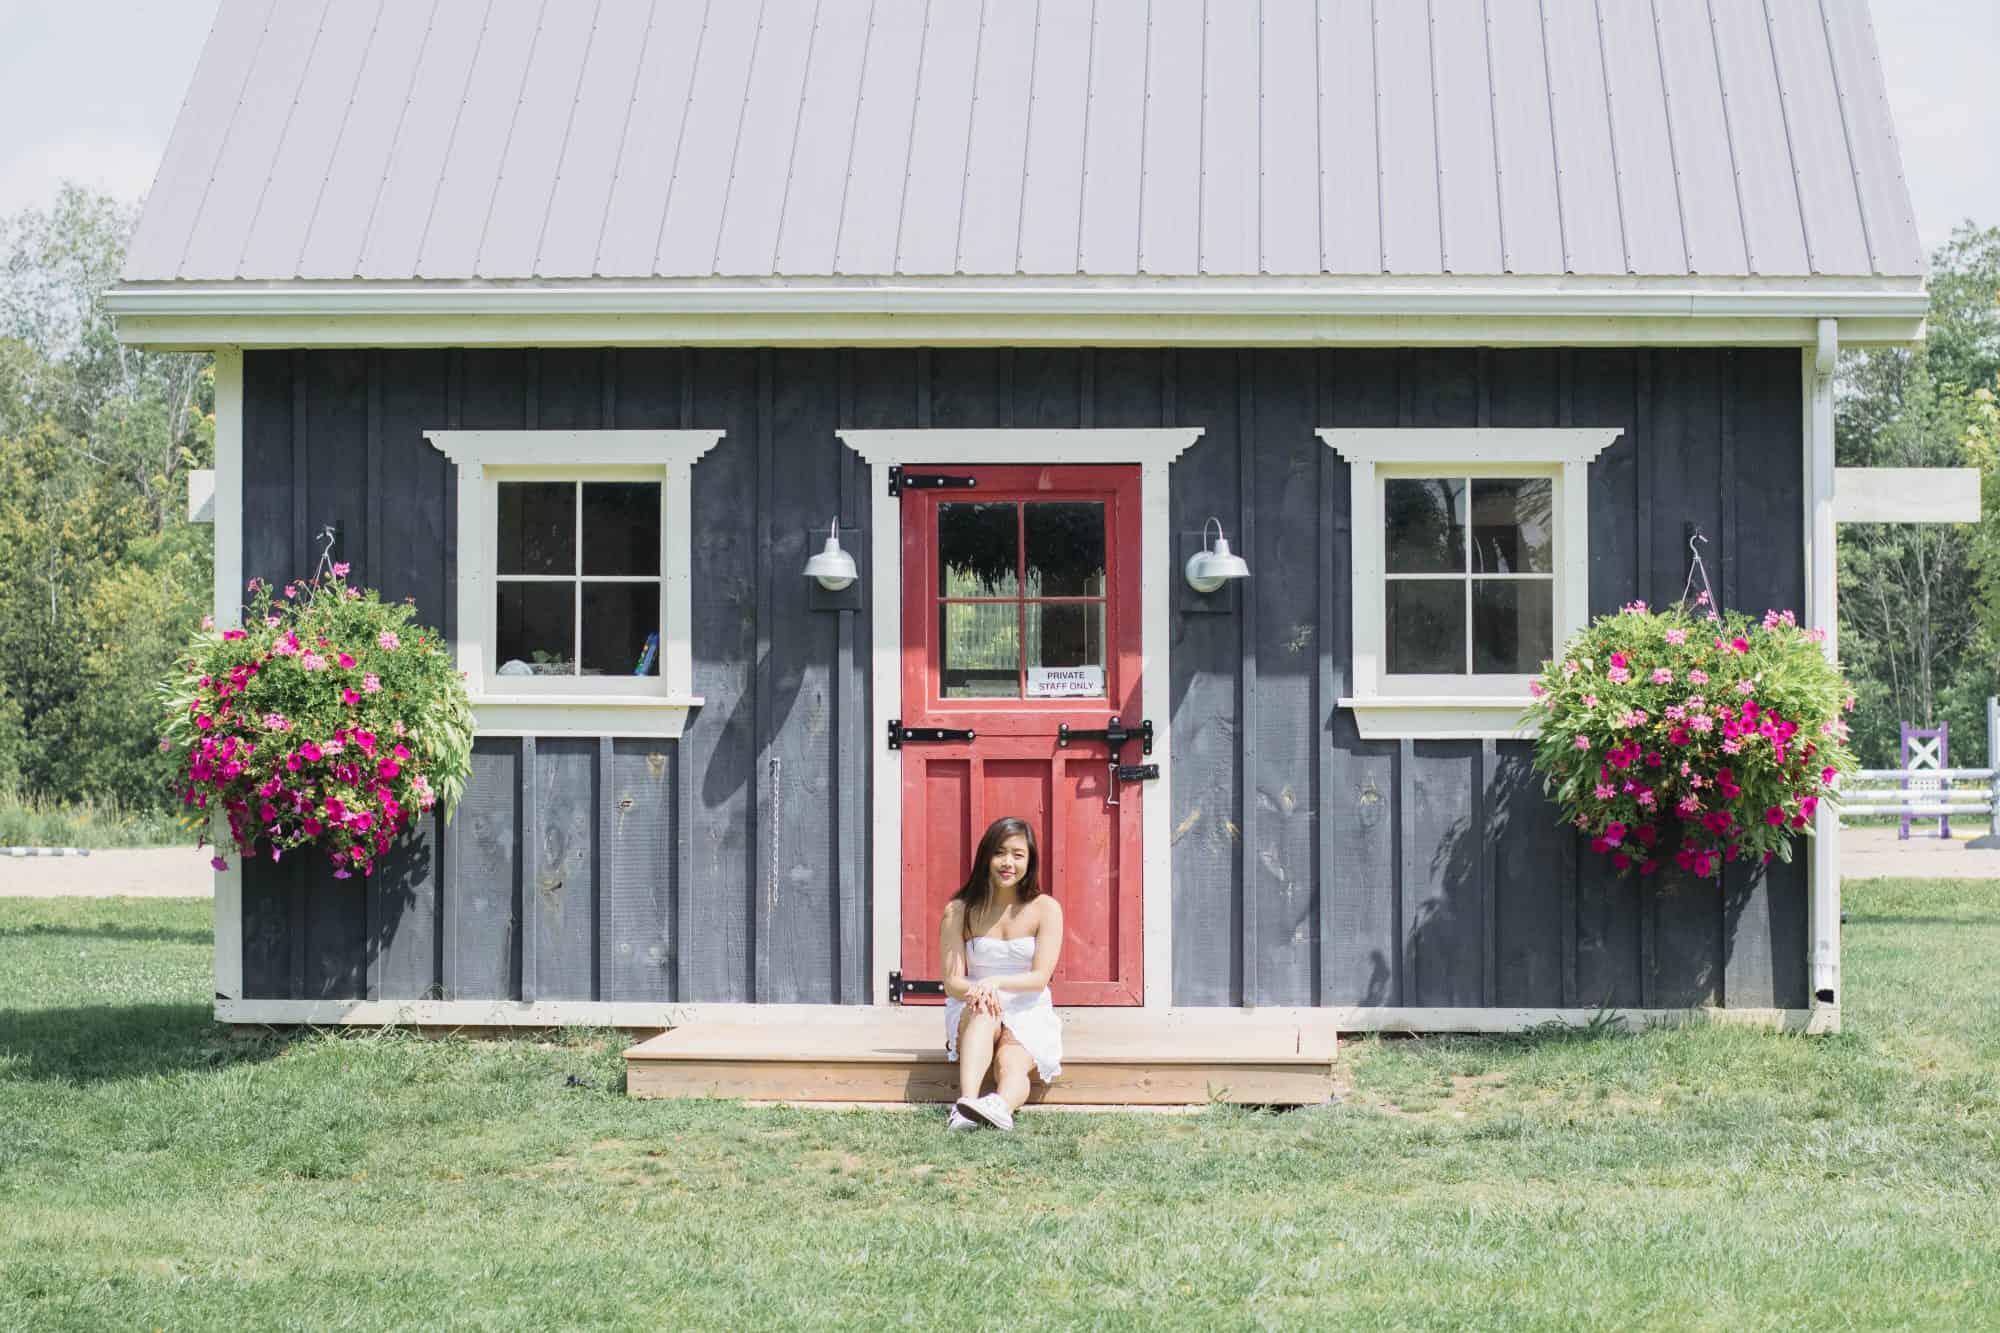 Terre Bleu Lavender Farm in Milton, Ontario   summer road trip ideas near Toronto   Diary of a Toronto Girl, a Canadian lifestyle blog